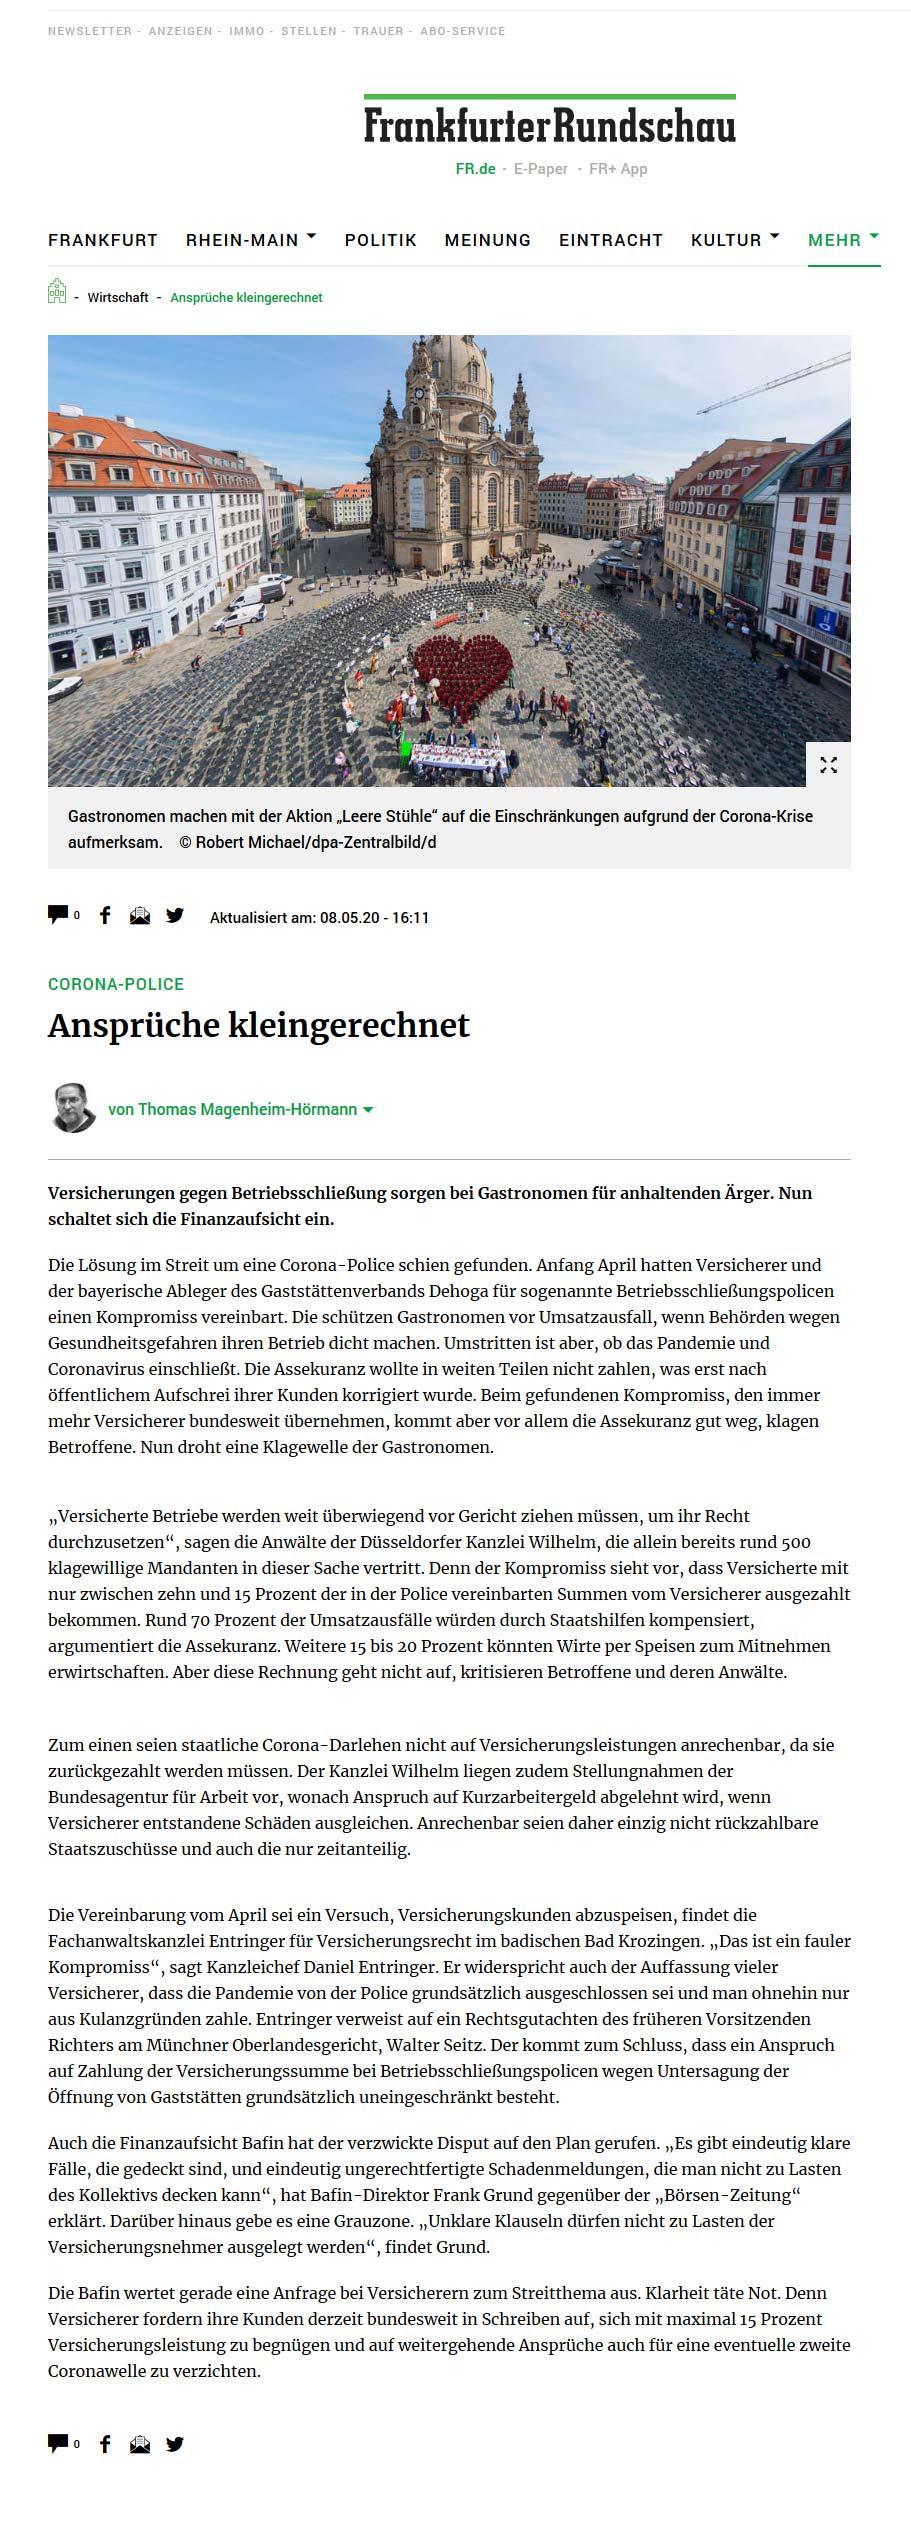 Betriebsschließungsversicherung Frankfurter Rundschau